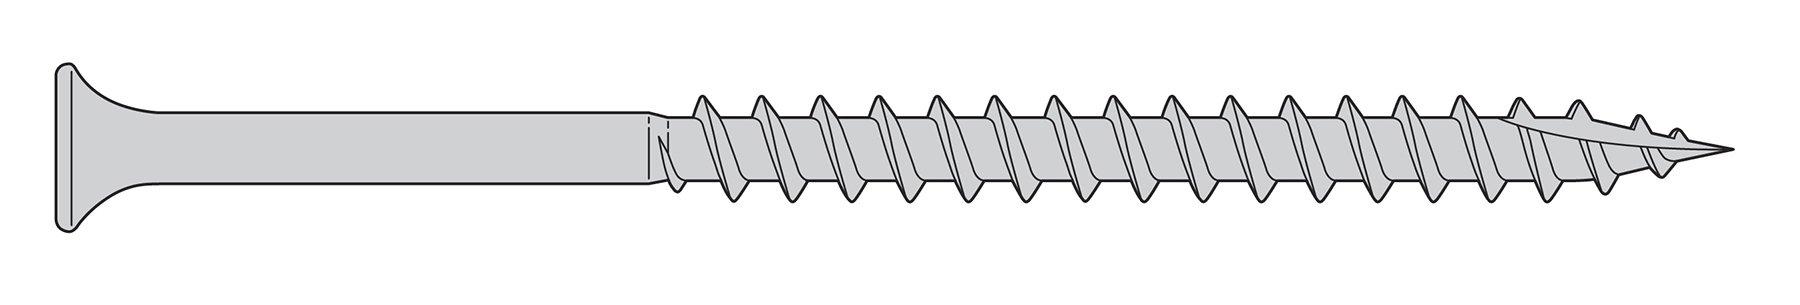 7 x 2-1/4'' Deck Screws - 1,000 Pieces - Trim Head, Star Drive, 305 Stainless Steel, Type 17 Auger Point